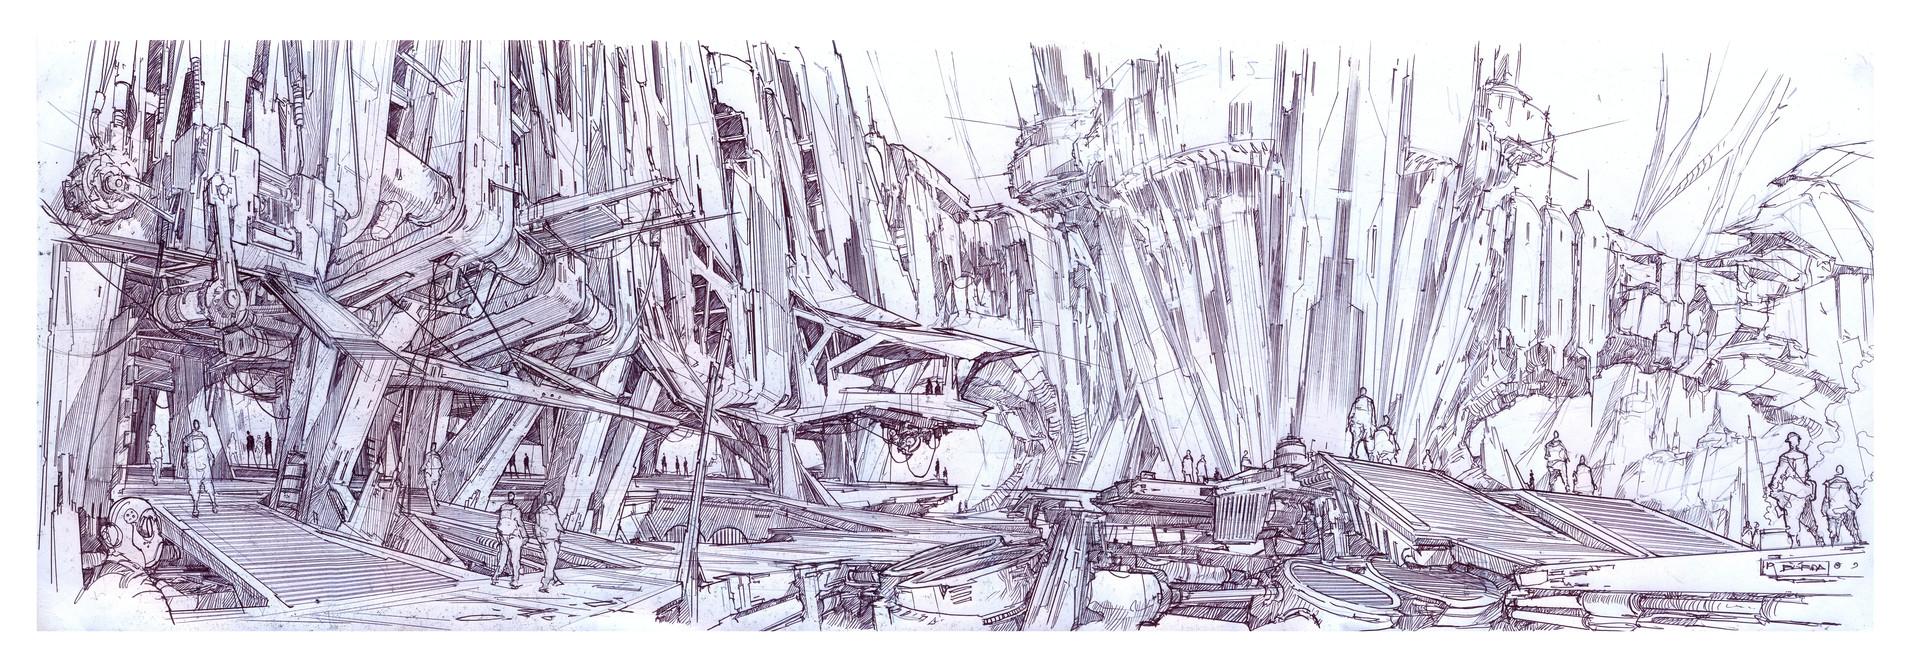 Alejandro burdisio boceto plaza telm panoramico1